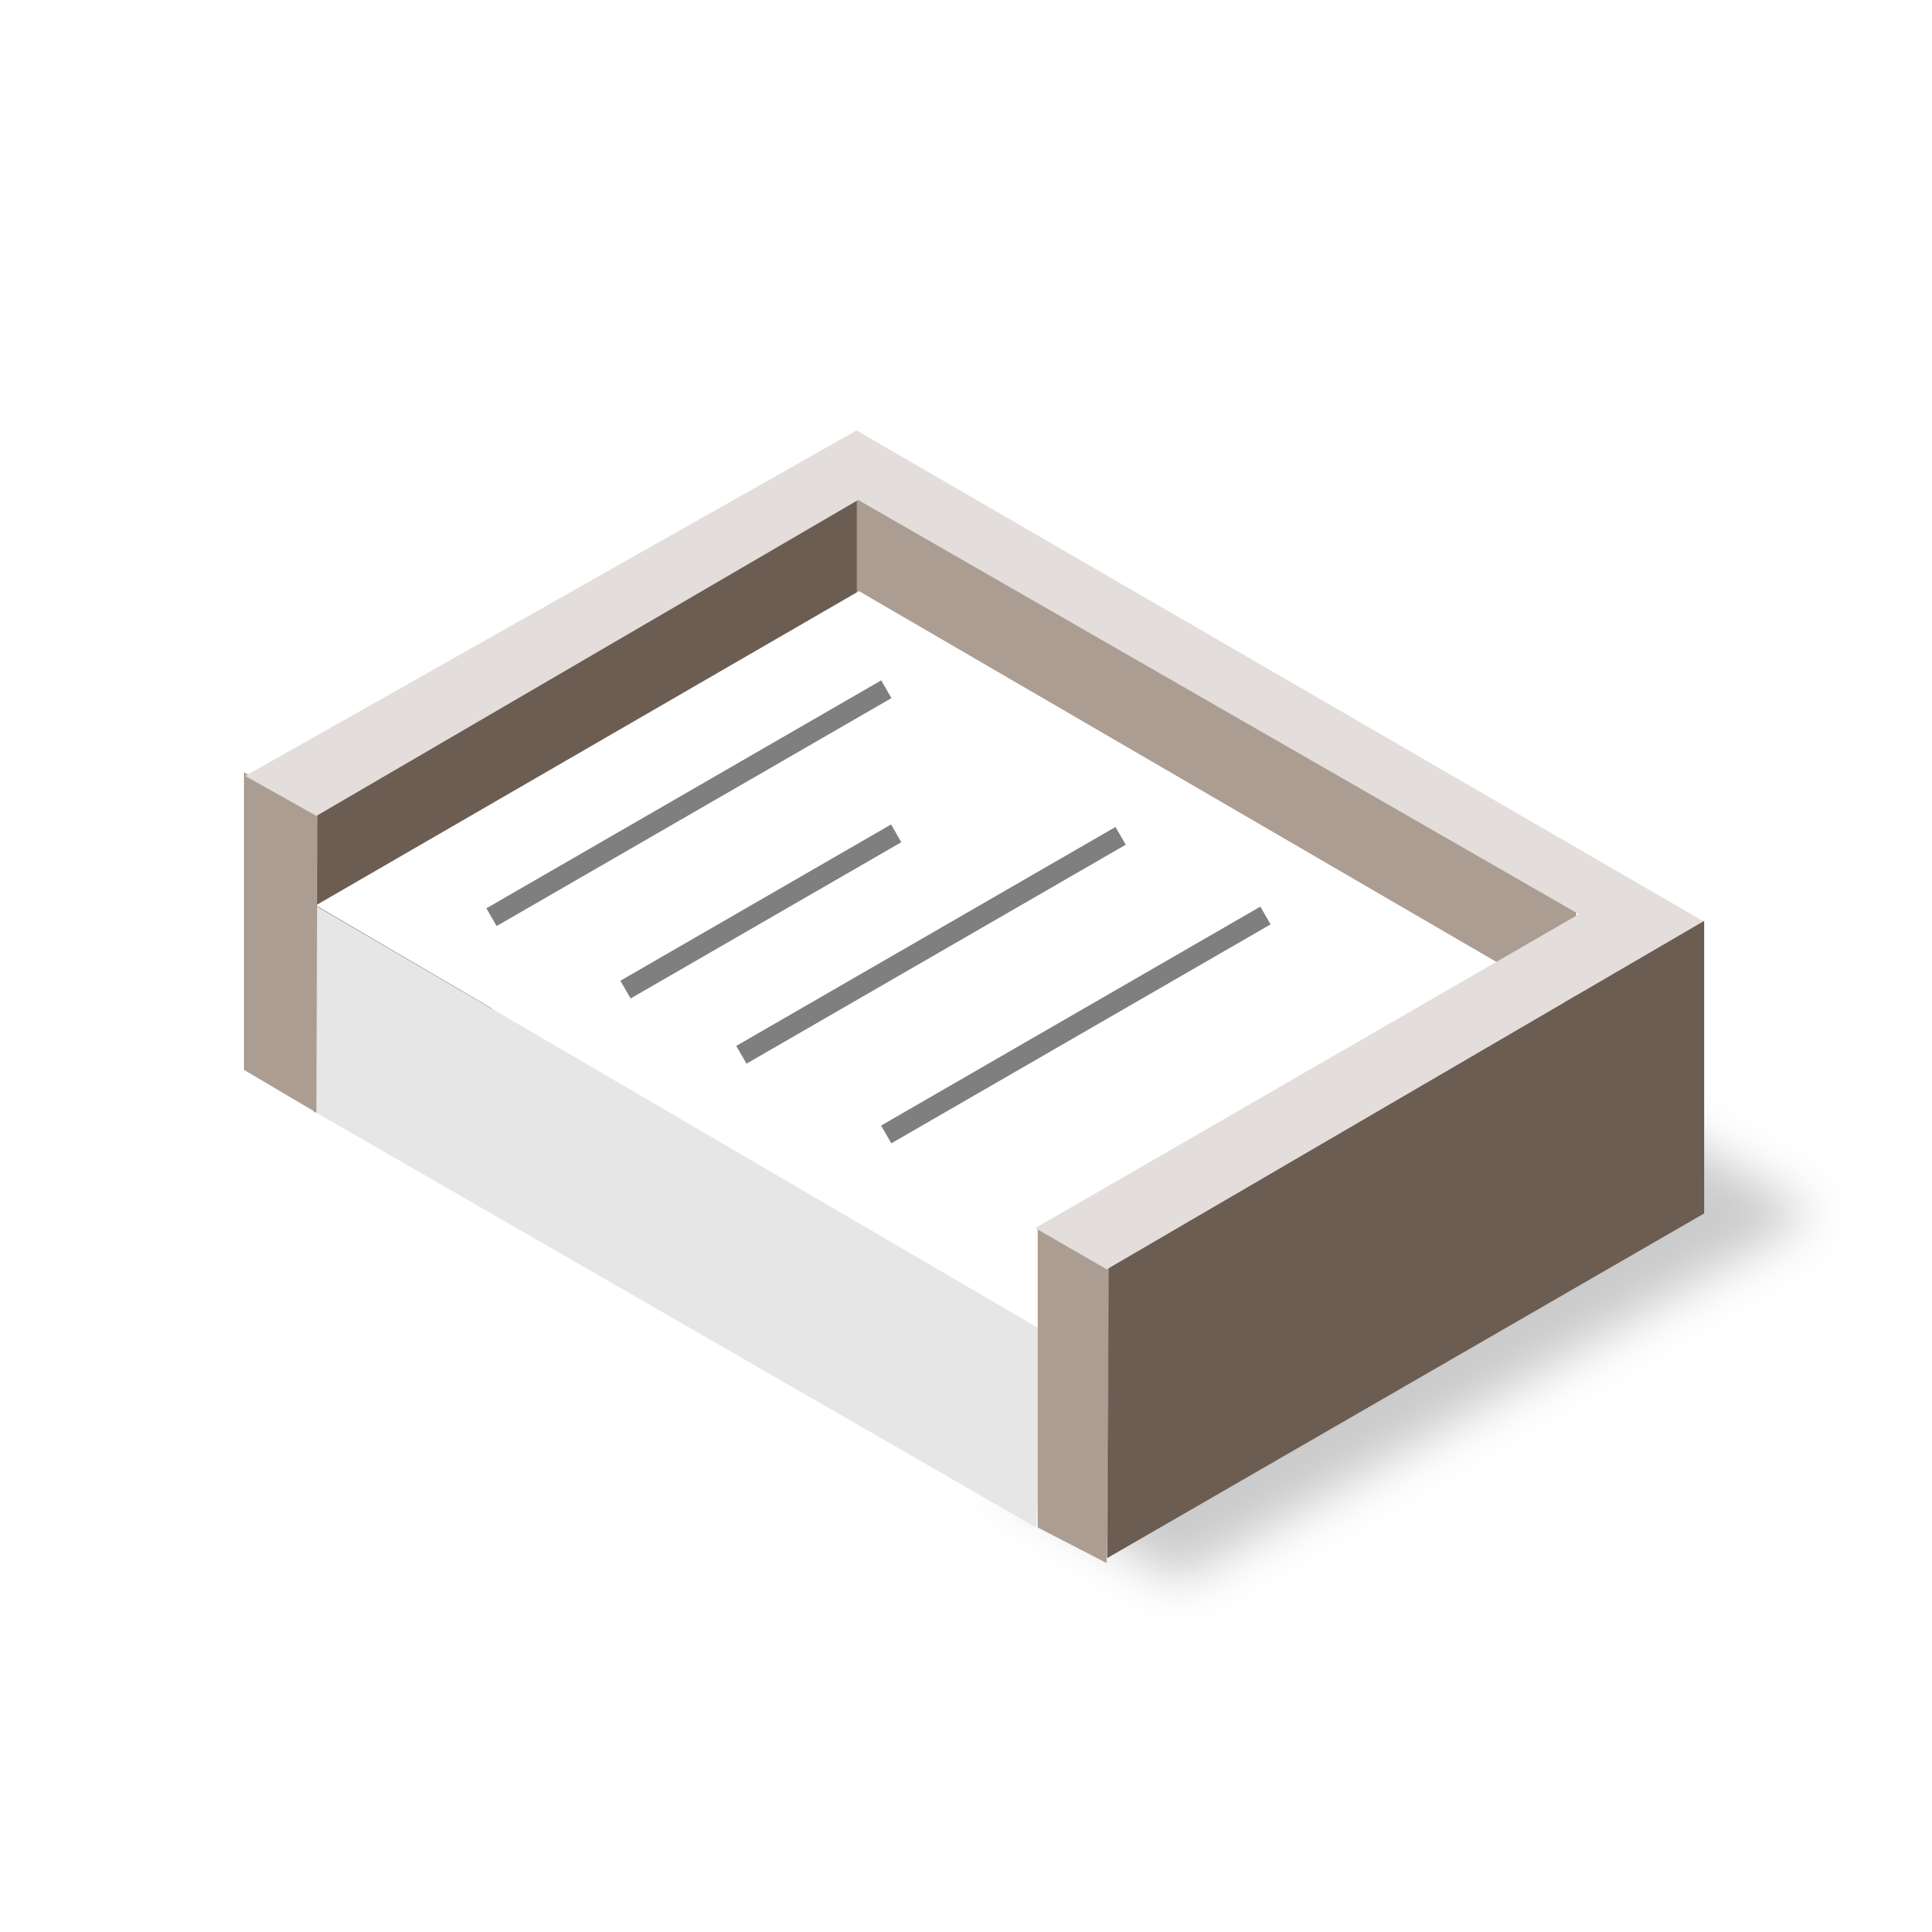 Paper clipart pile paper Organizer Pile Pile Clipart Organizer